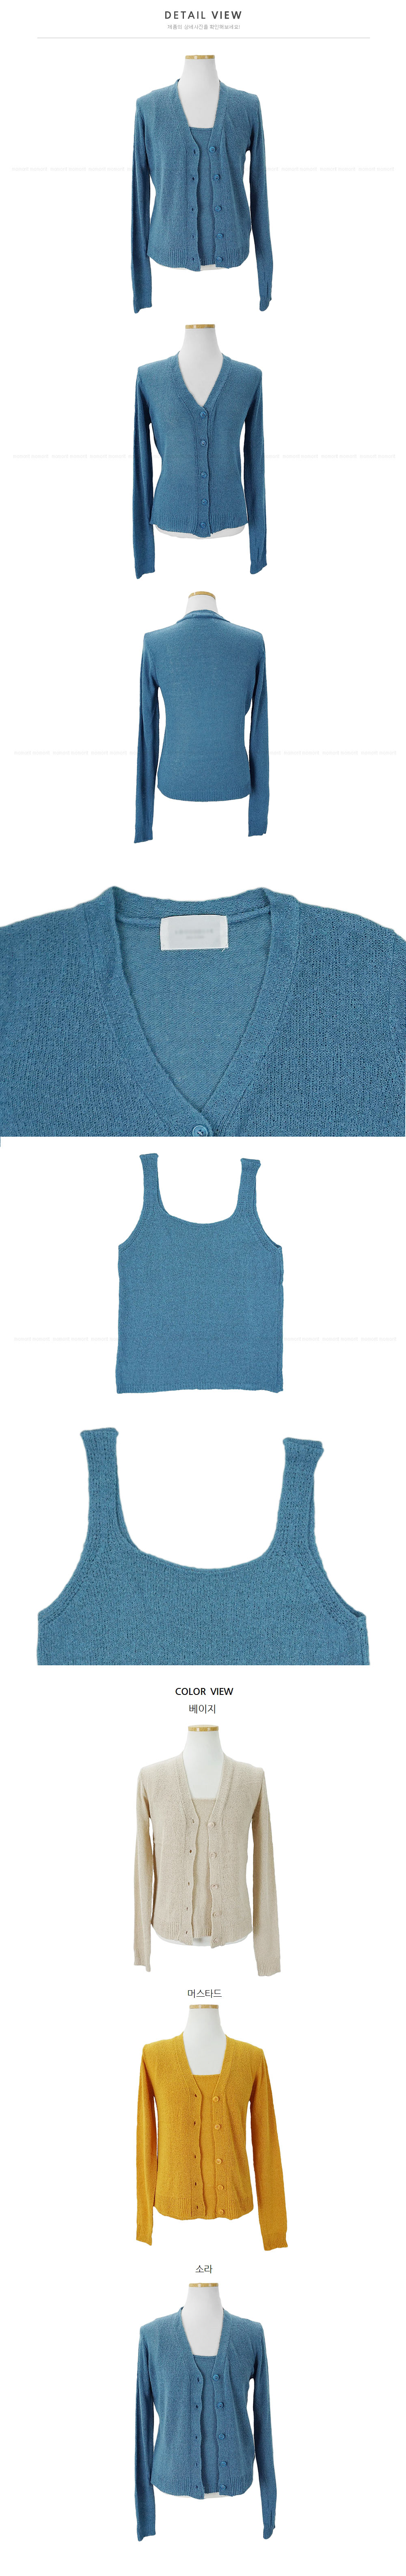 Square neck neck knit cardigan set 3color